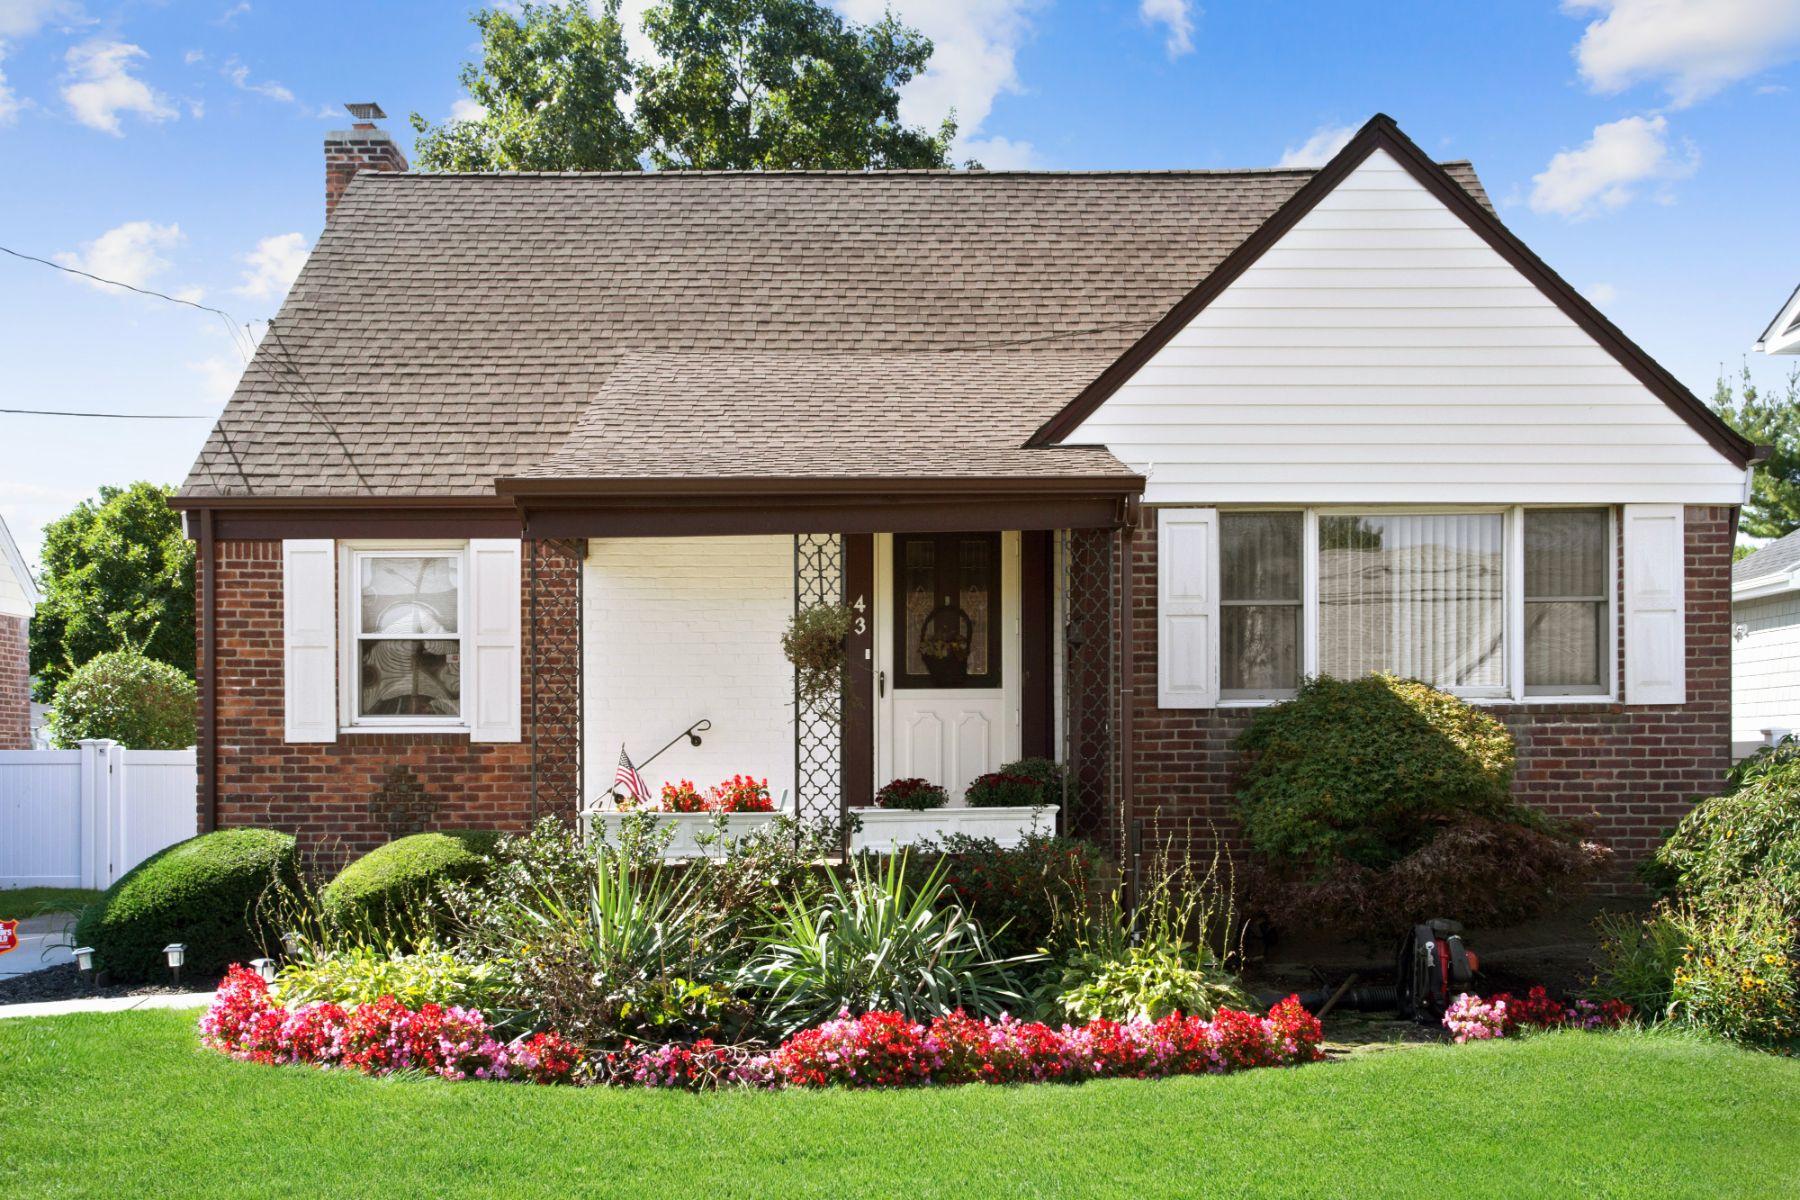 Single Family Homes for Sale at Malverne 43 W Morris Ave Malverne, New York 11565 United States